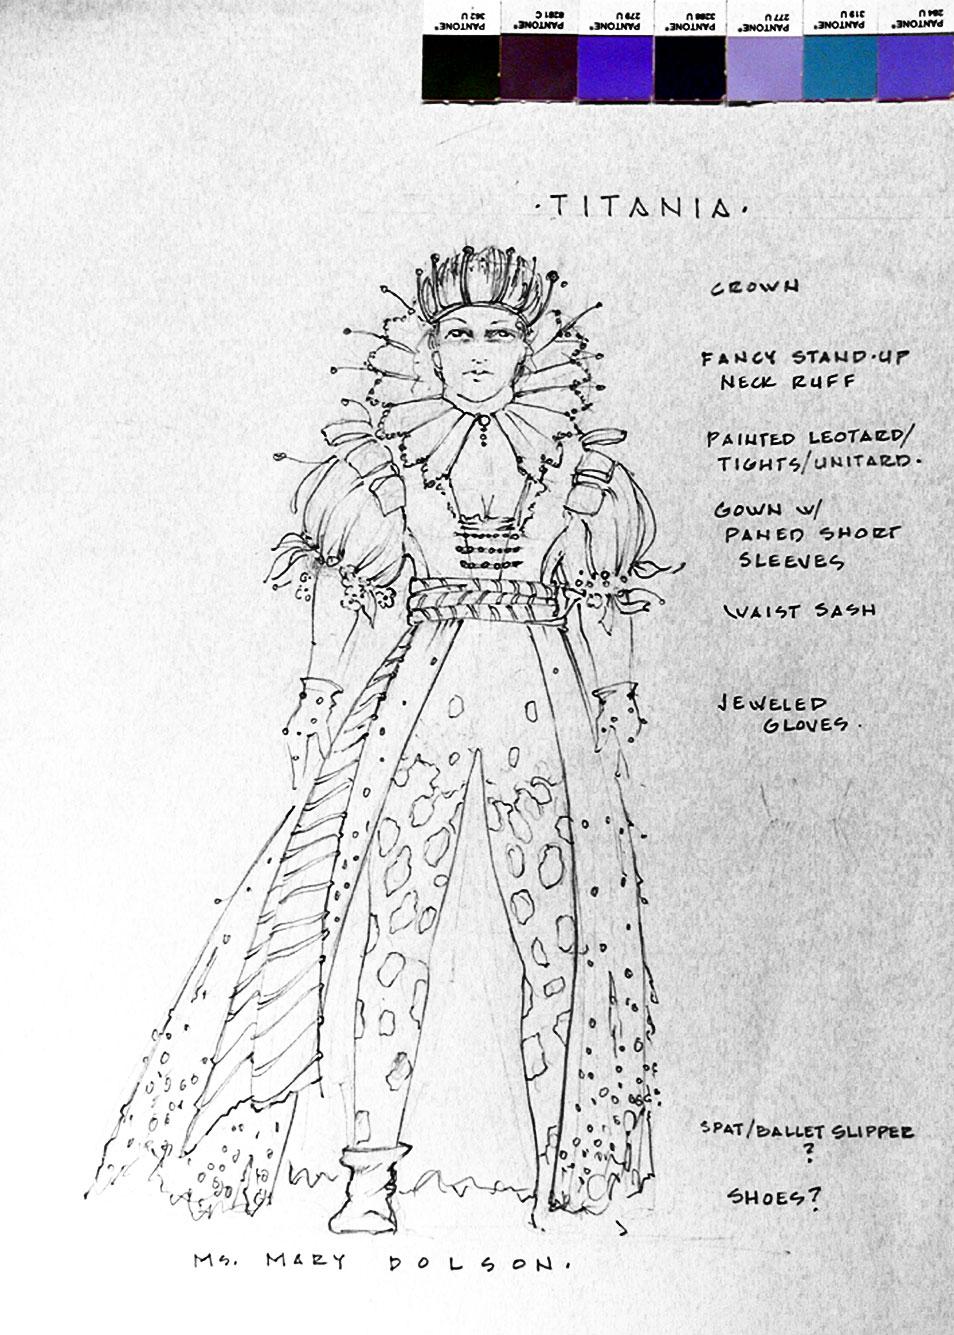 midsummer-nights-dream-titania-costume-design-michael-ganio.jpg